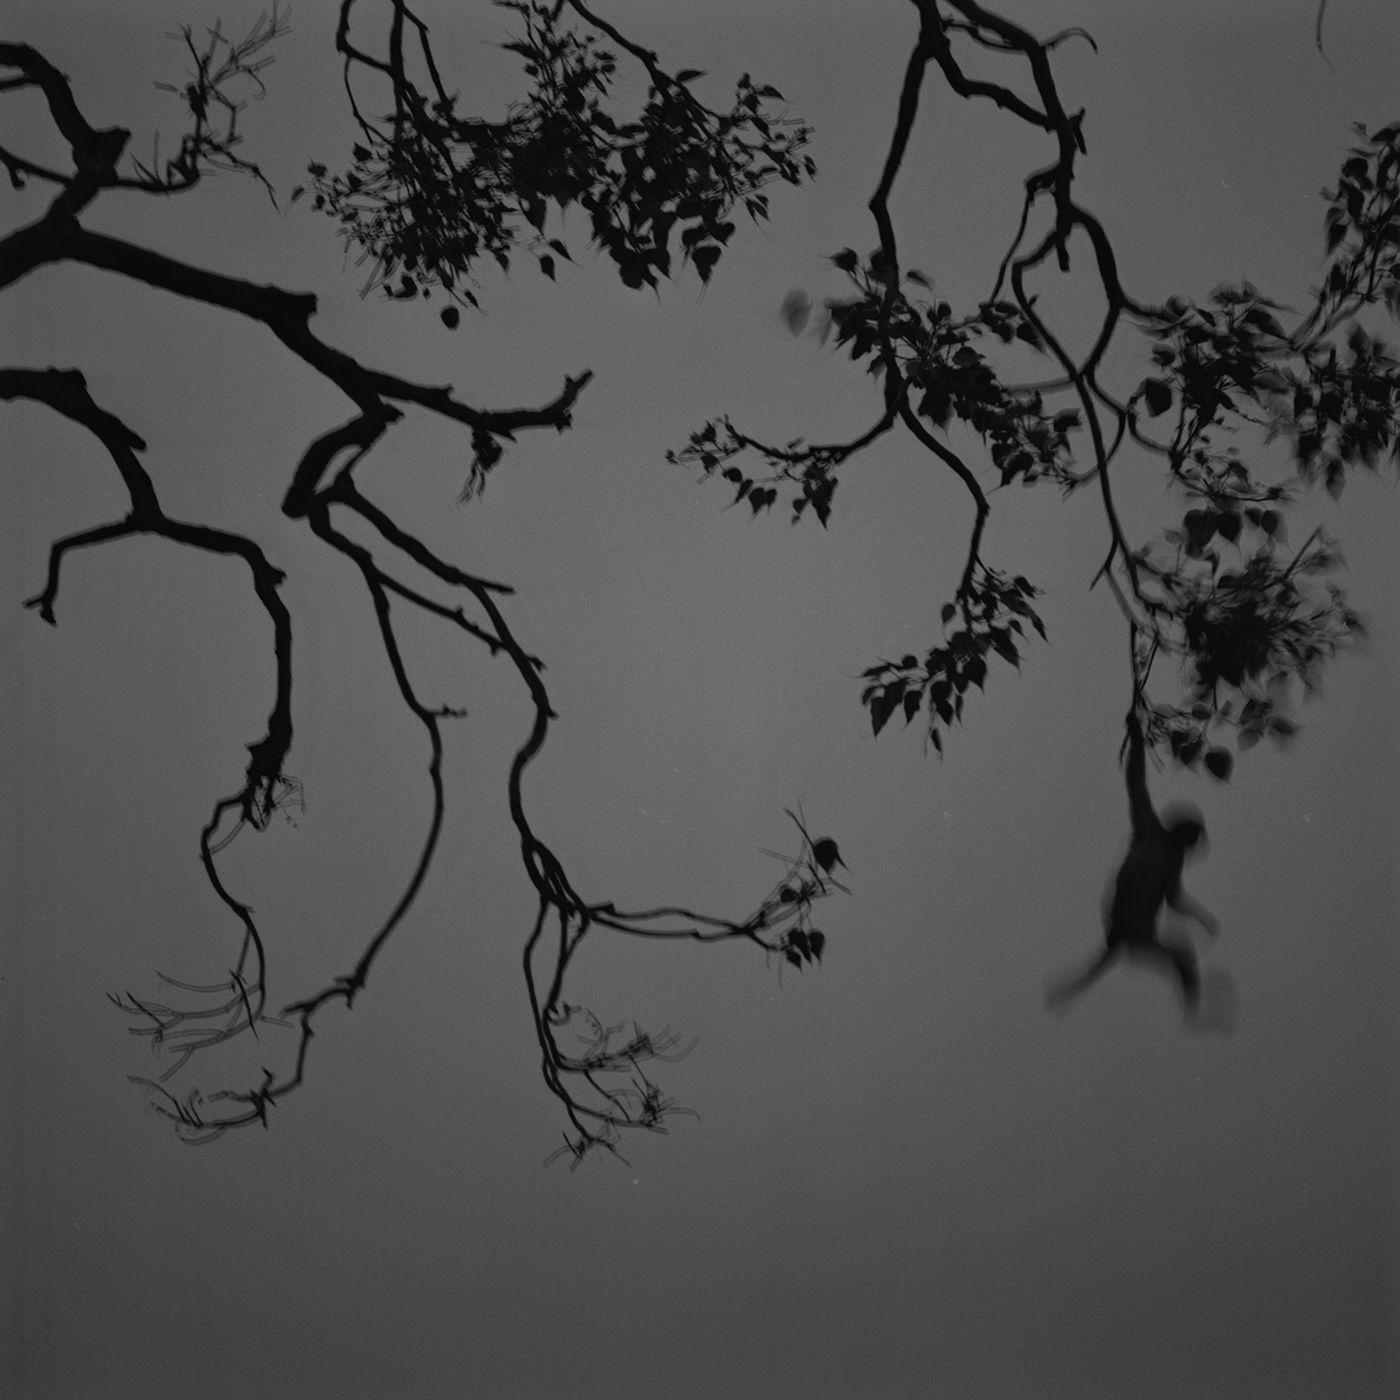 Kenro Izu: Eternal Light, Howard Greenberg Gallery, 2017